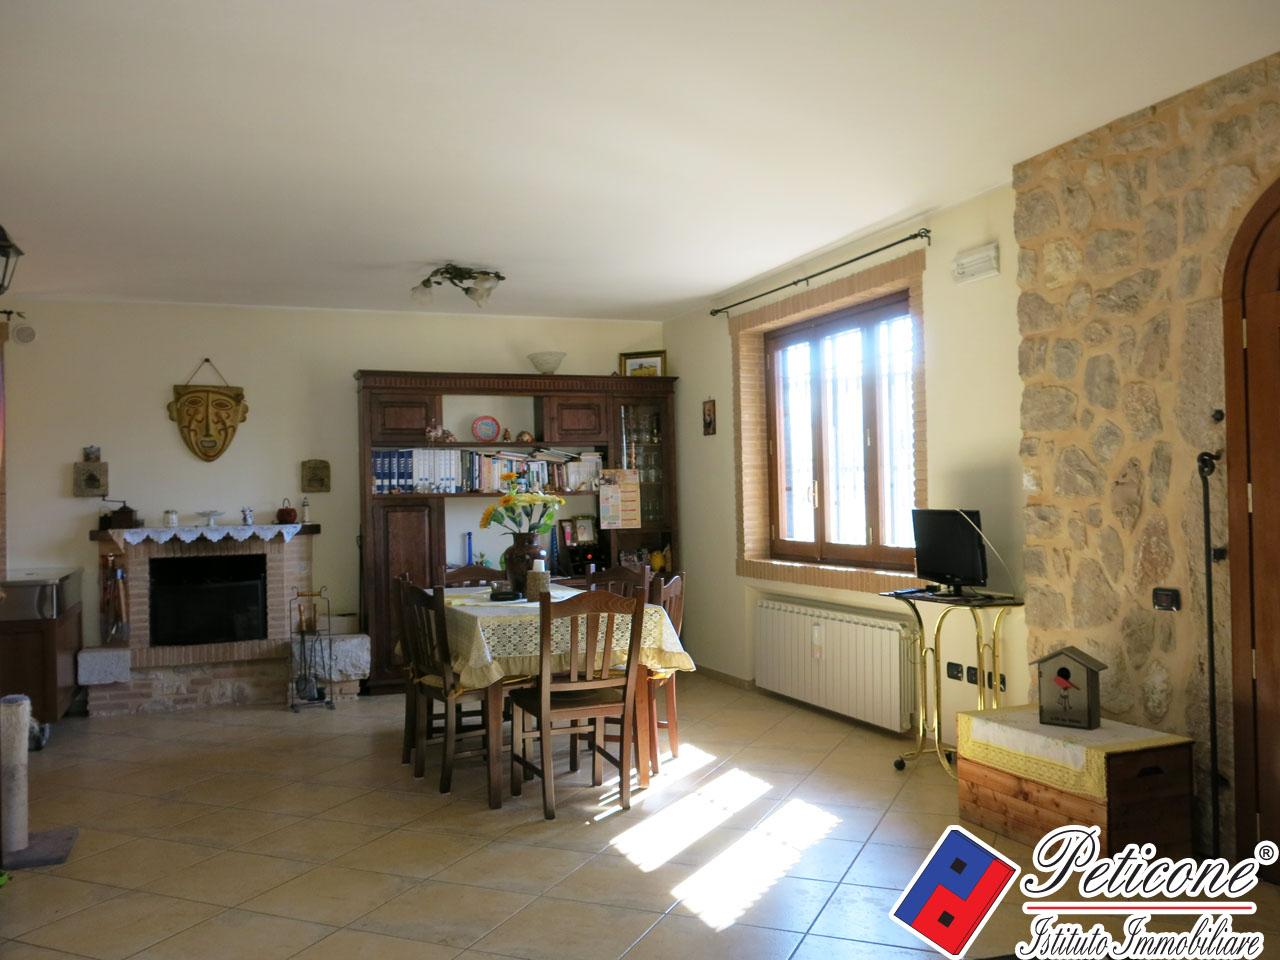 Villa in Vendita a Fondi: 3 locali, 107 mq - Foto 5